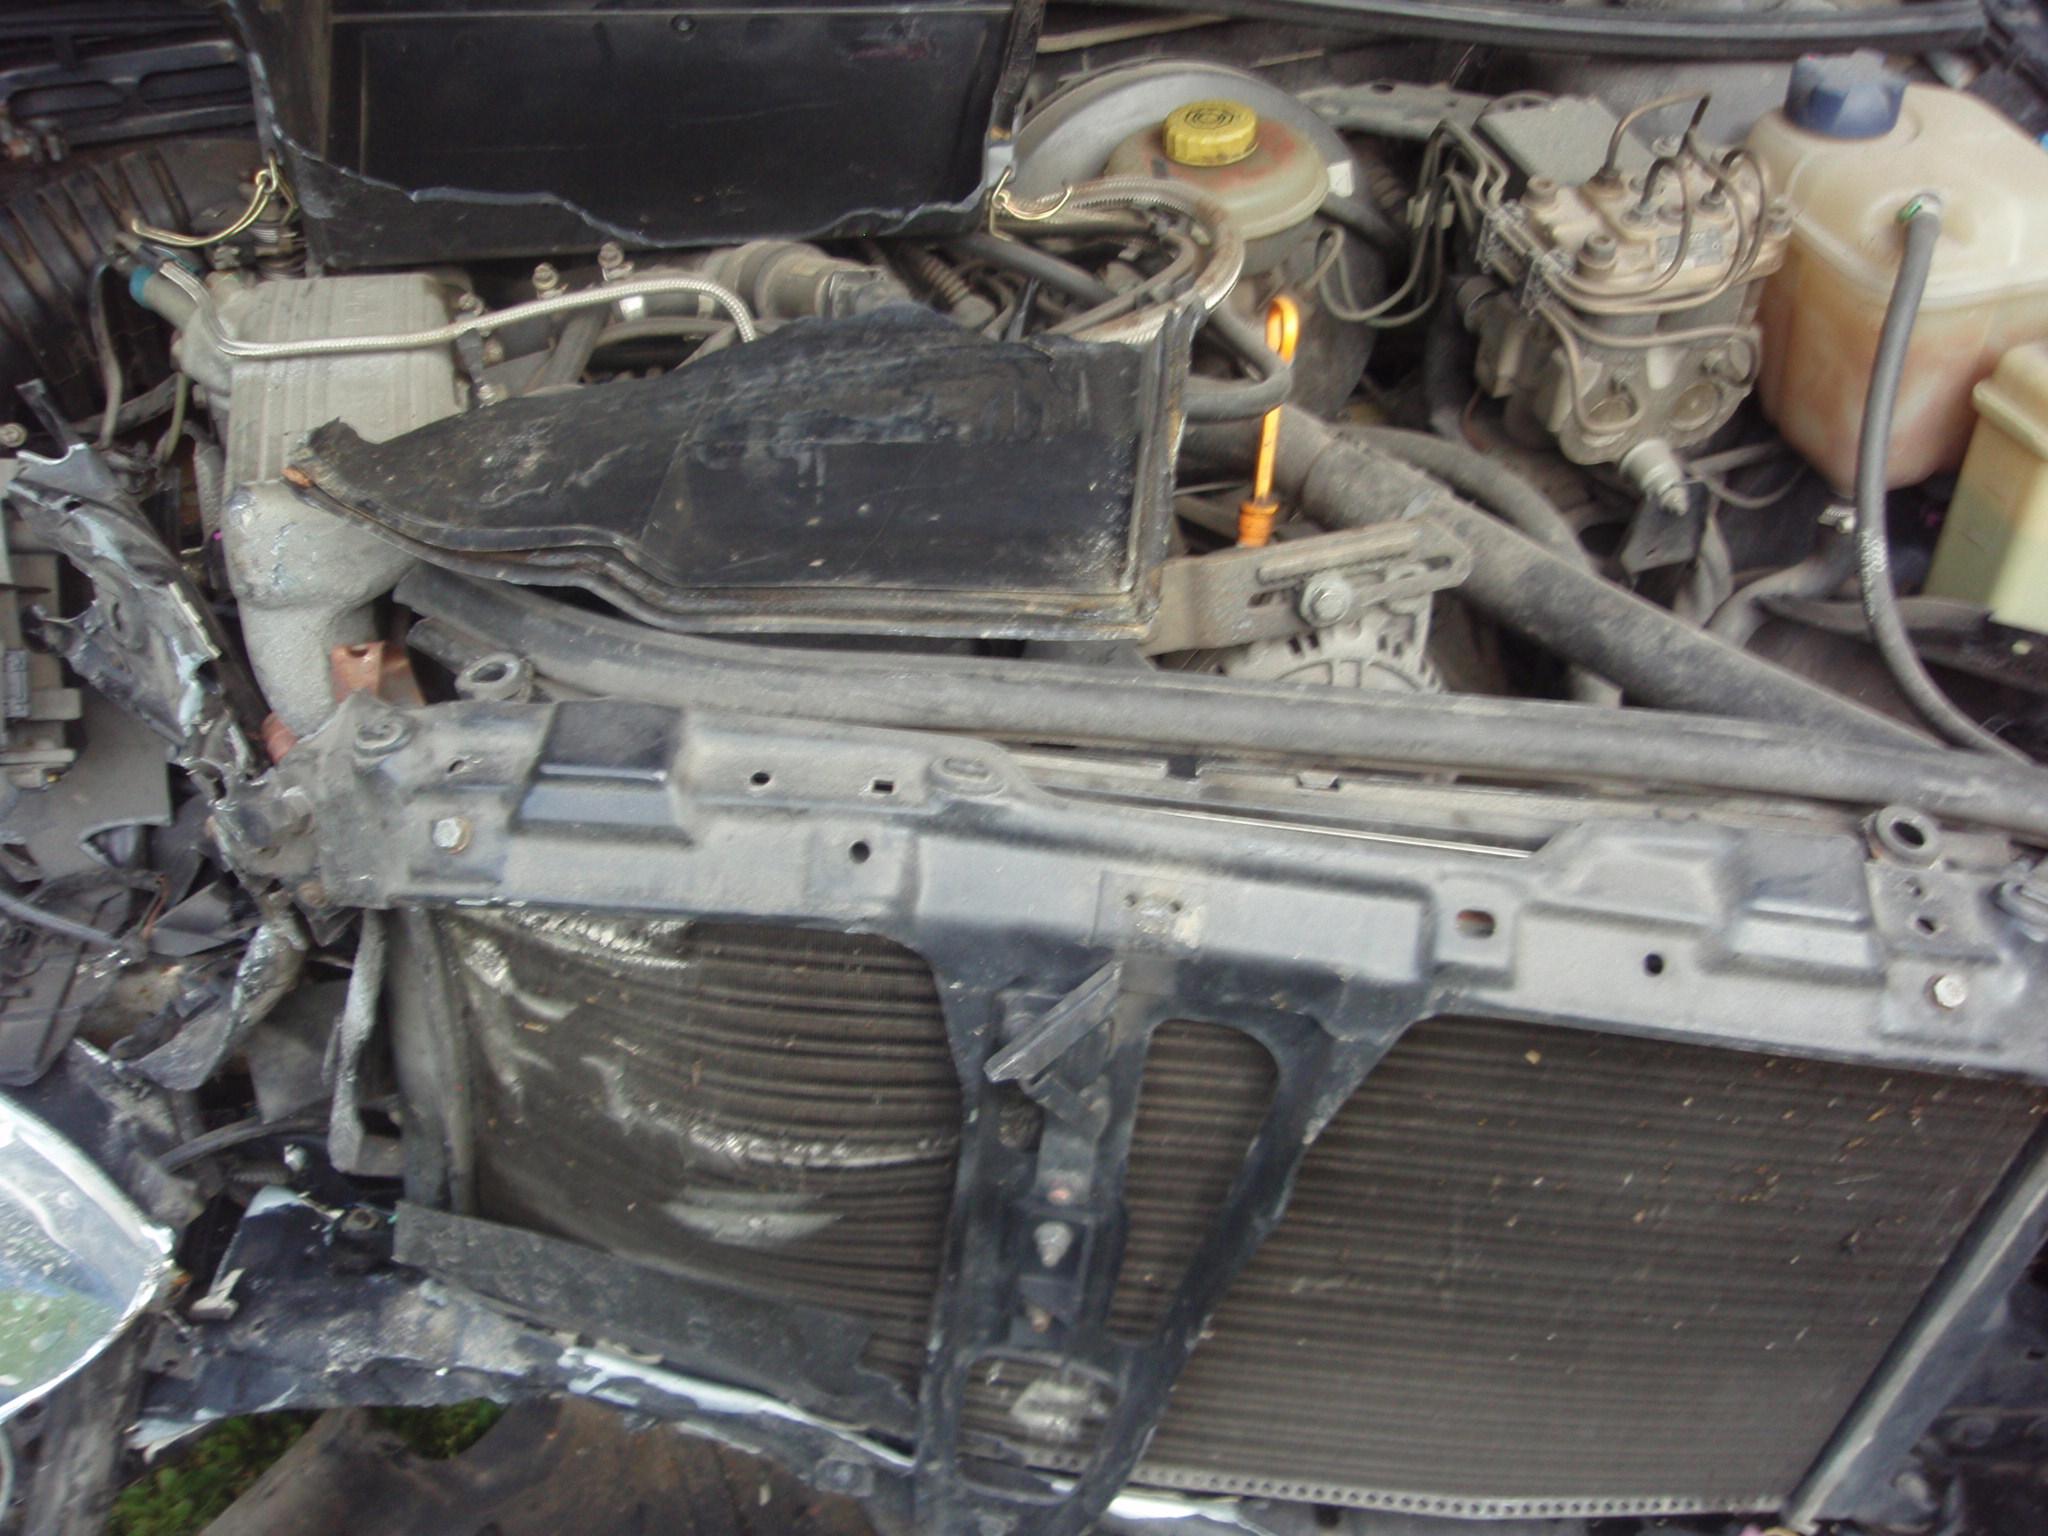 Audi 80 avariat 1993 Benzina Berlina - 25 Iulie 2011 - Poza 4